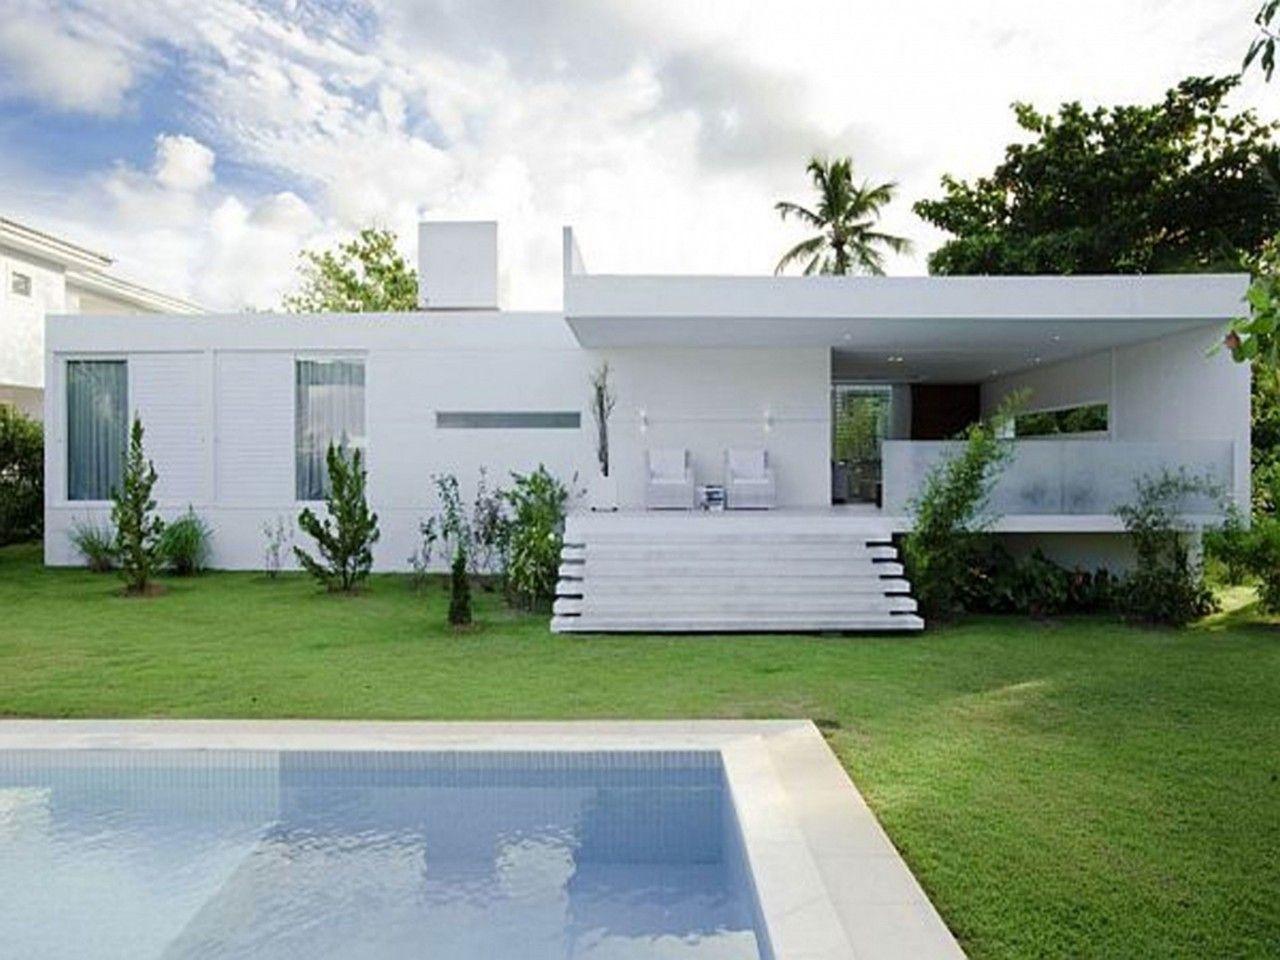 Charming house design scheme heavenly modern house interior splendid